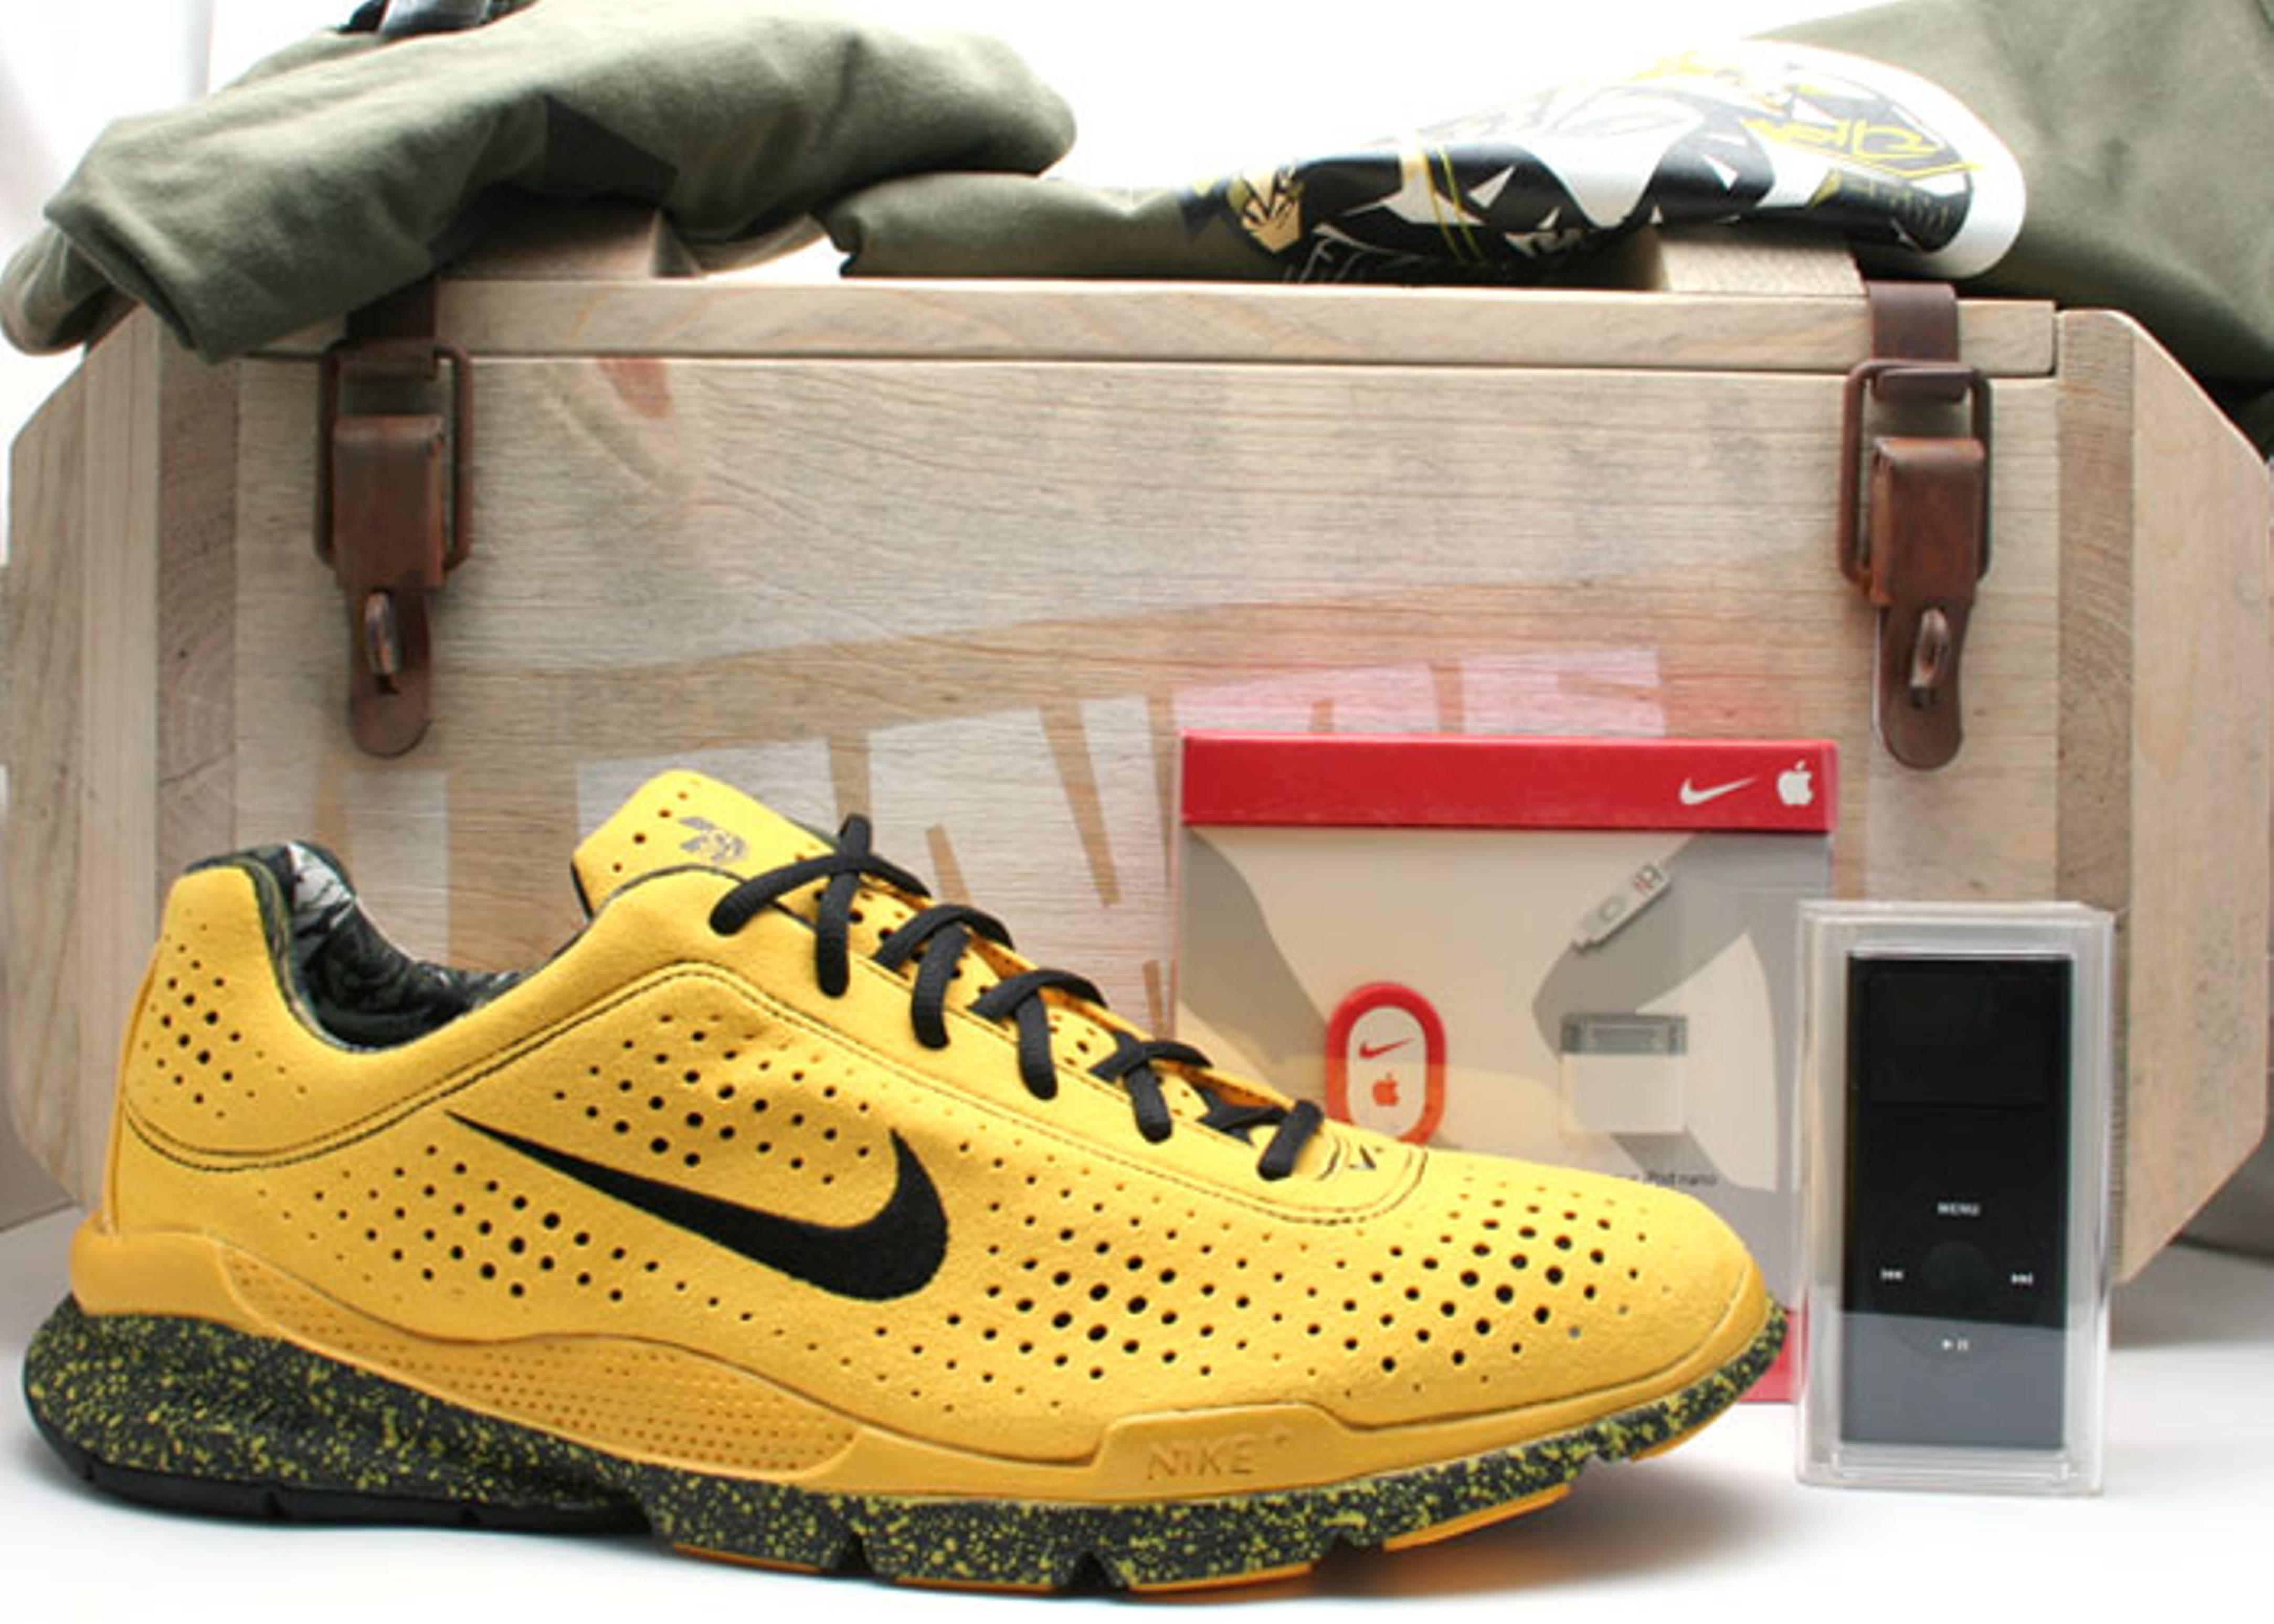 37c313c011c344 Jordan NikeJordan ShoesJordan ... nike air zoom plus lance ...